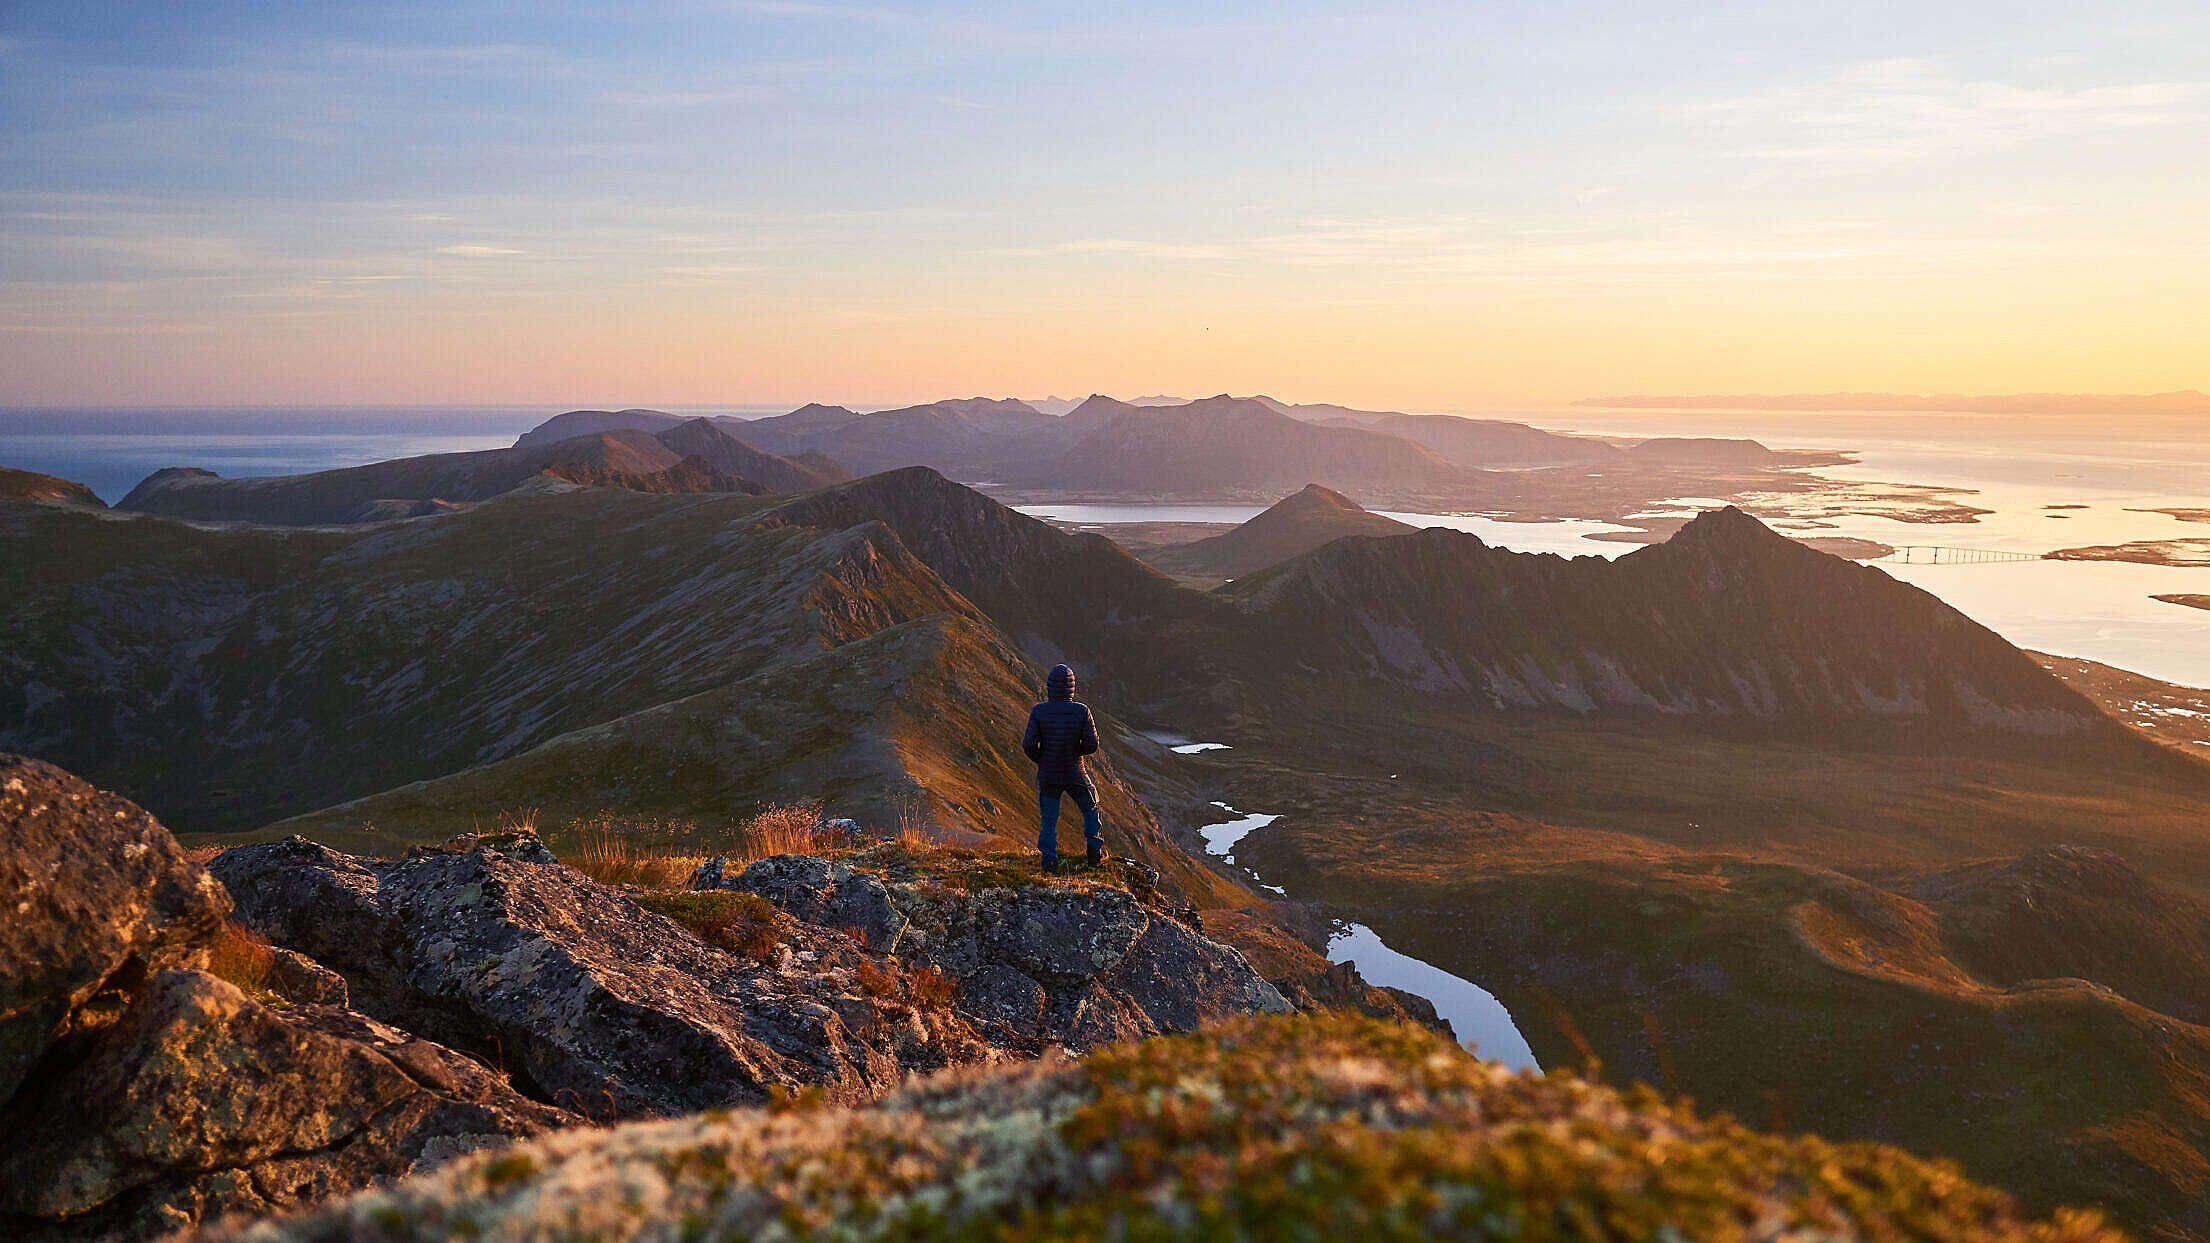 Man on Hiking Adventure During Beautiful Sunrise Free Stock Photo